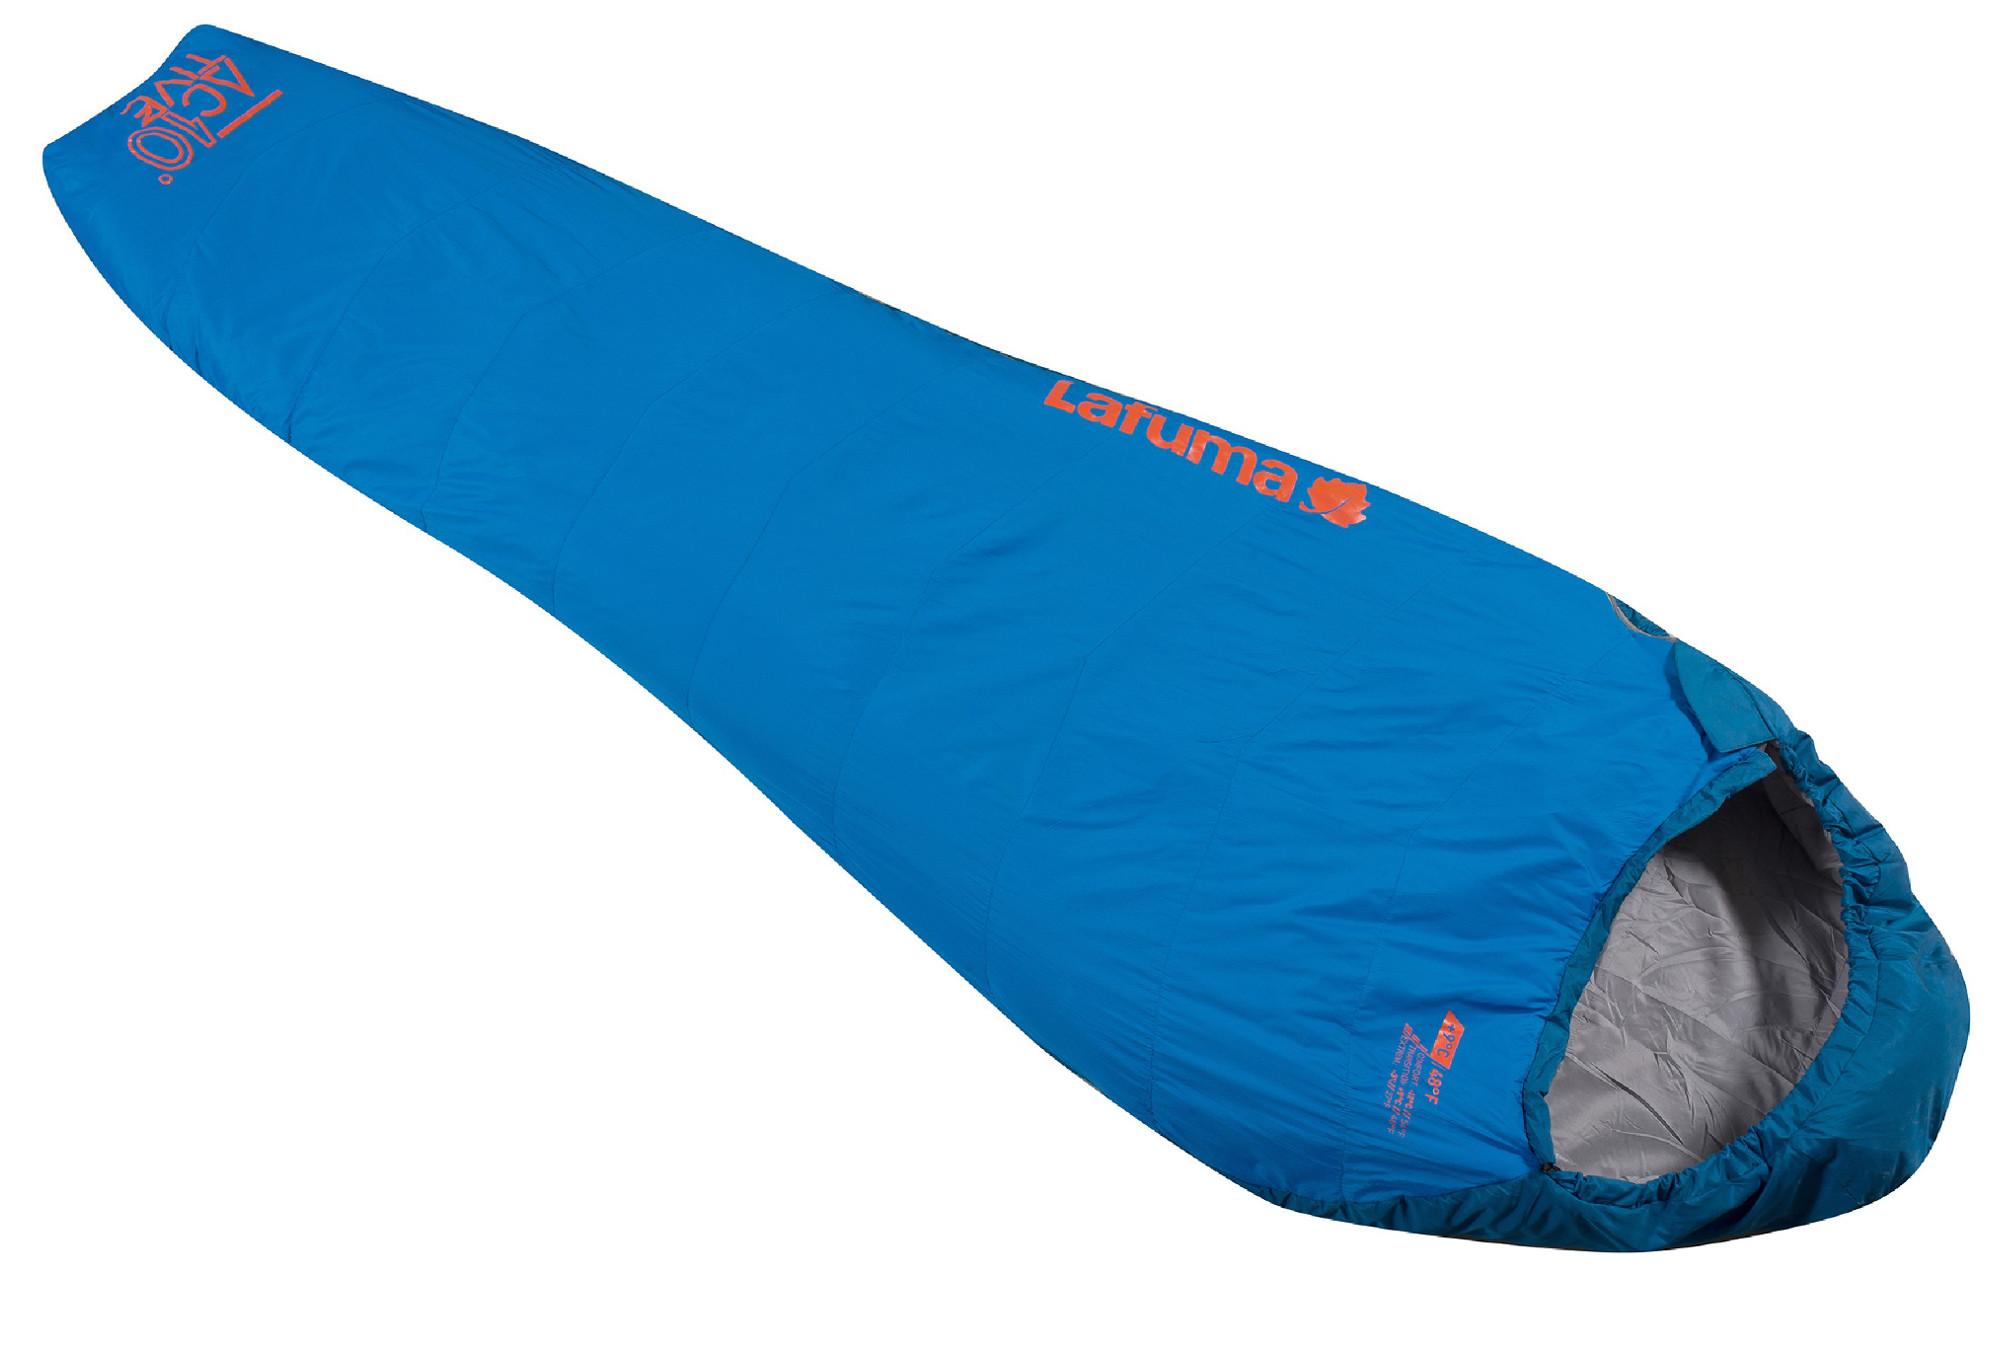 sac de couchage lafuma active 10 gauche bleu gauche. Black Bedroom Furniture Sets. Home Design Ideas